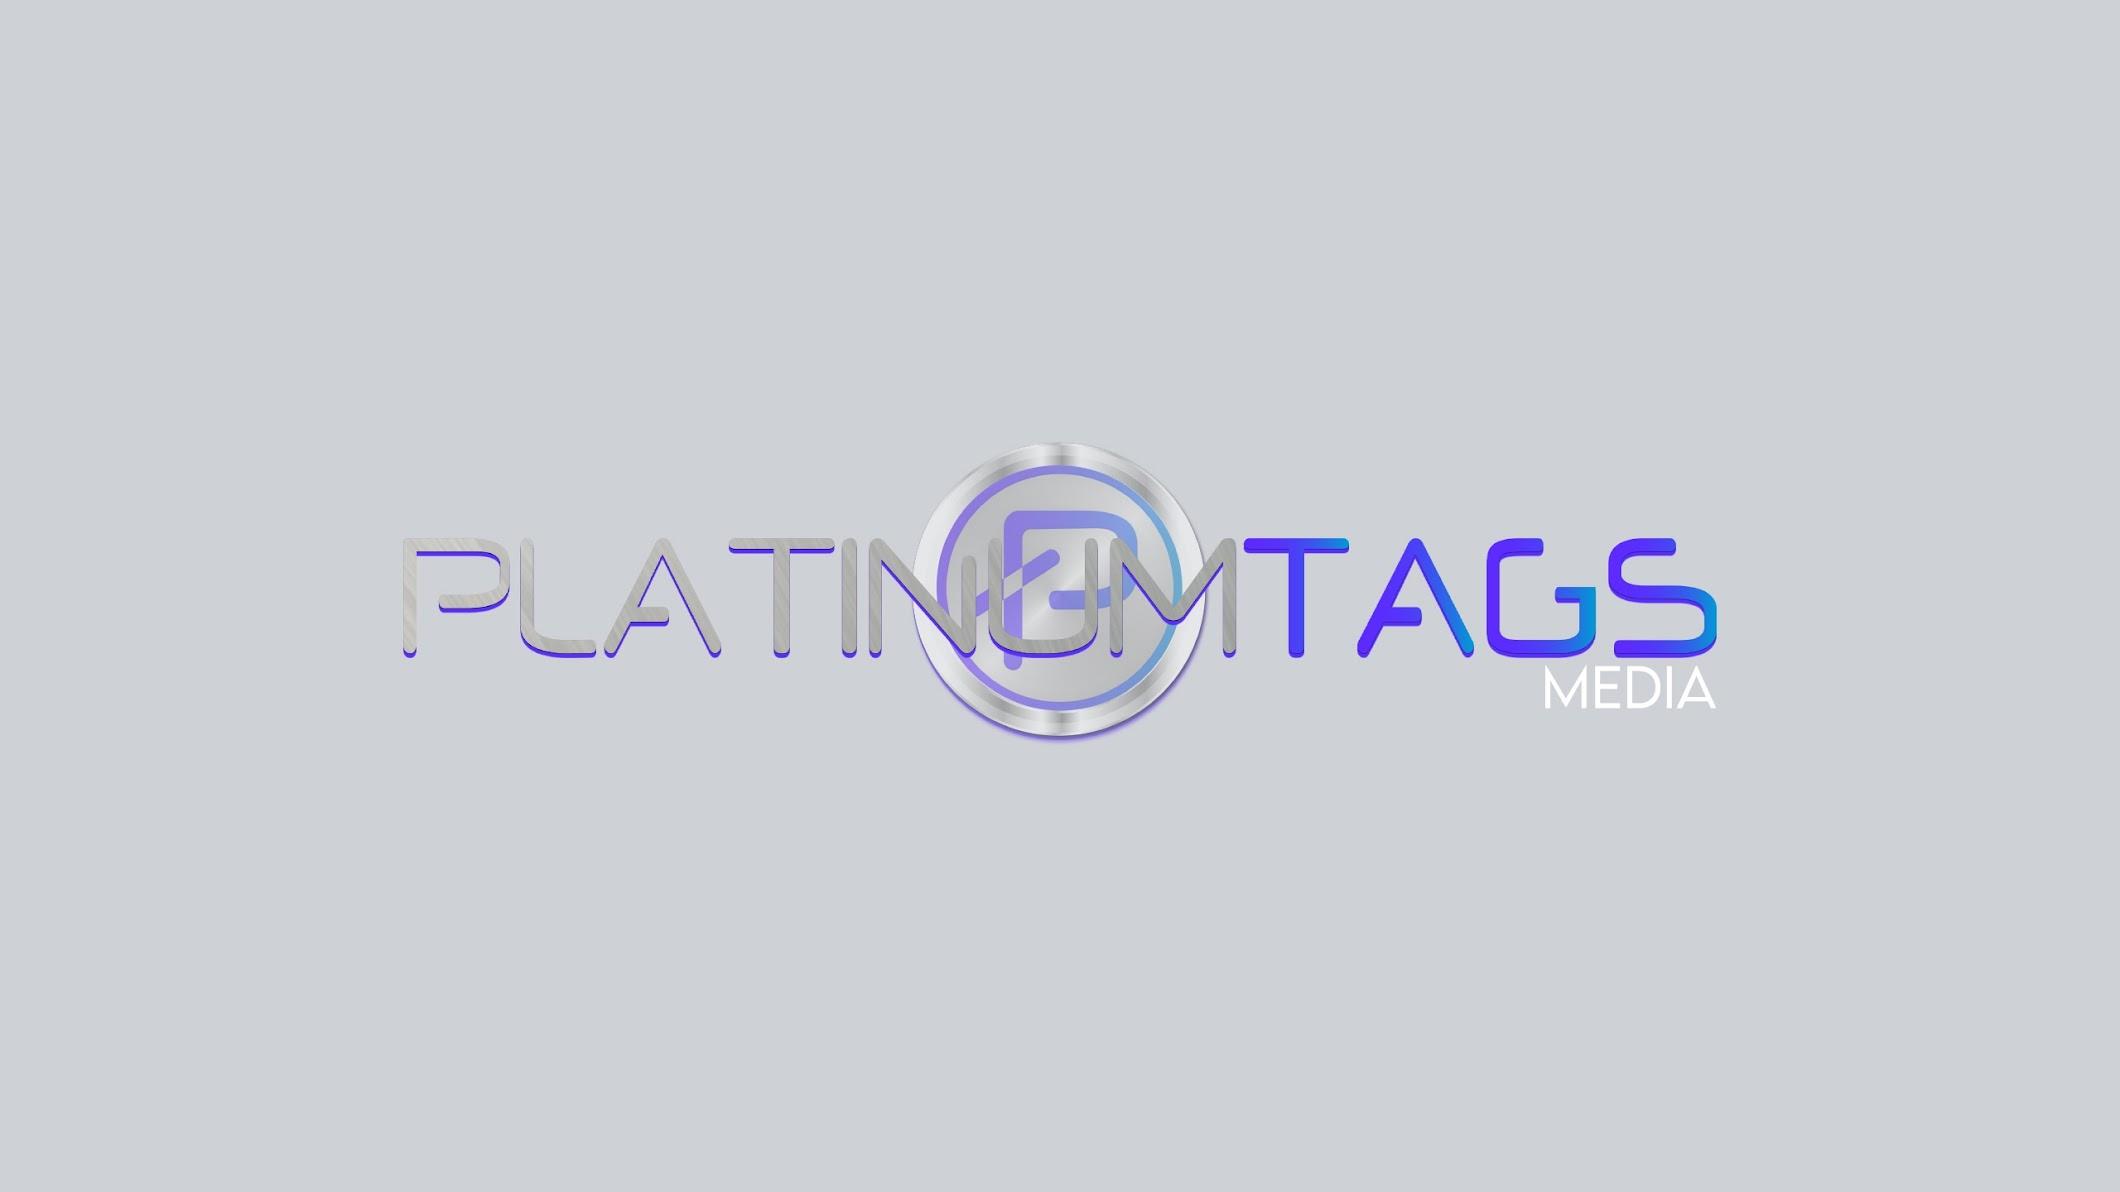 PlatinumTags Media